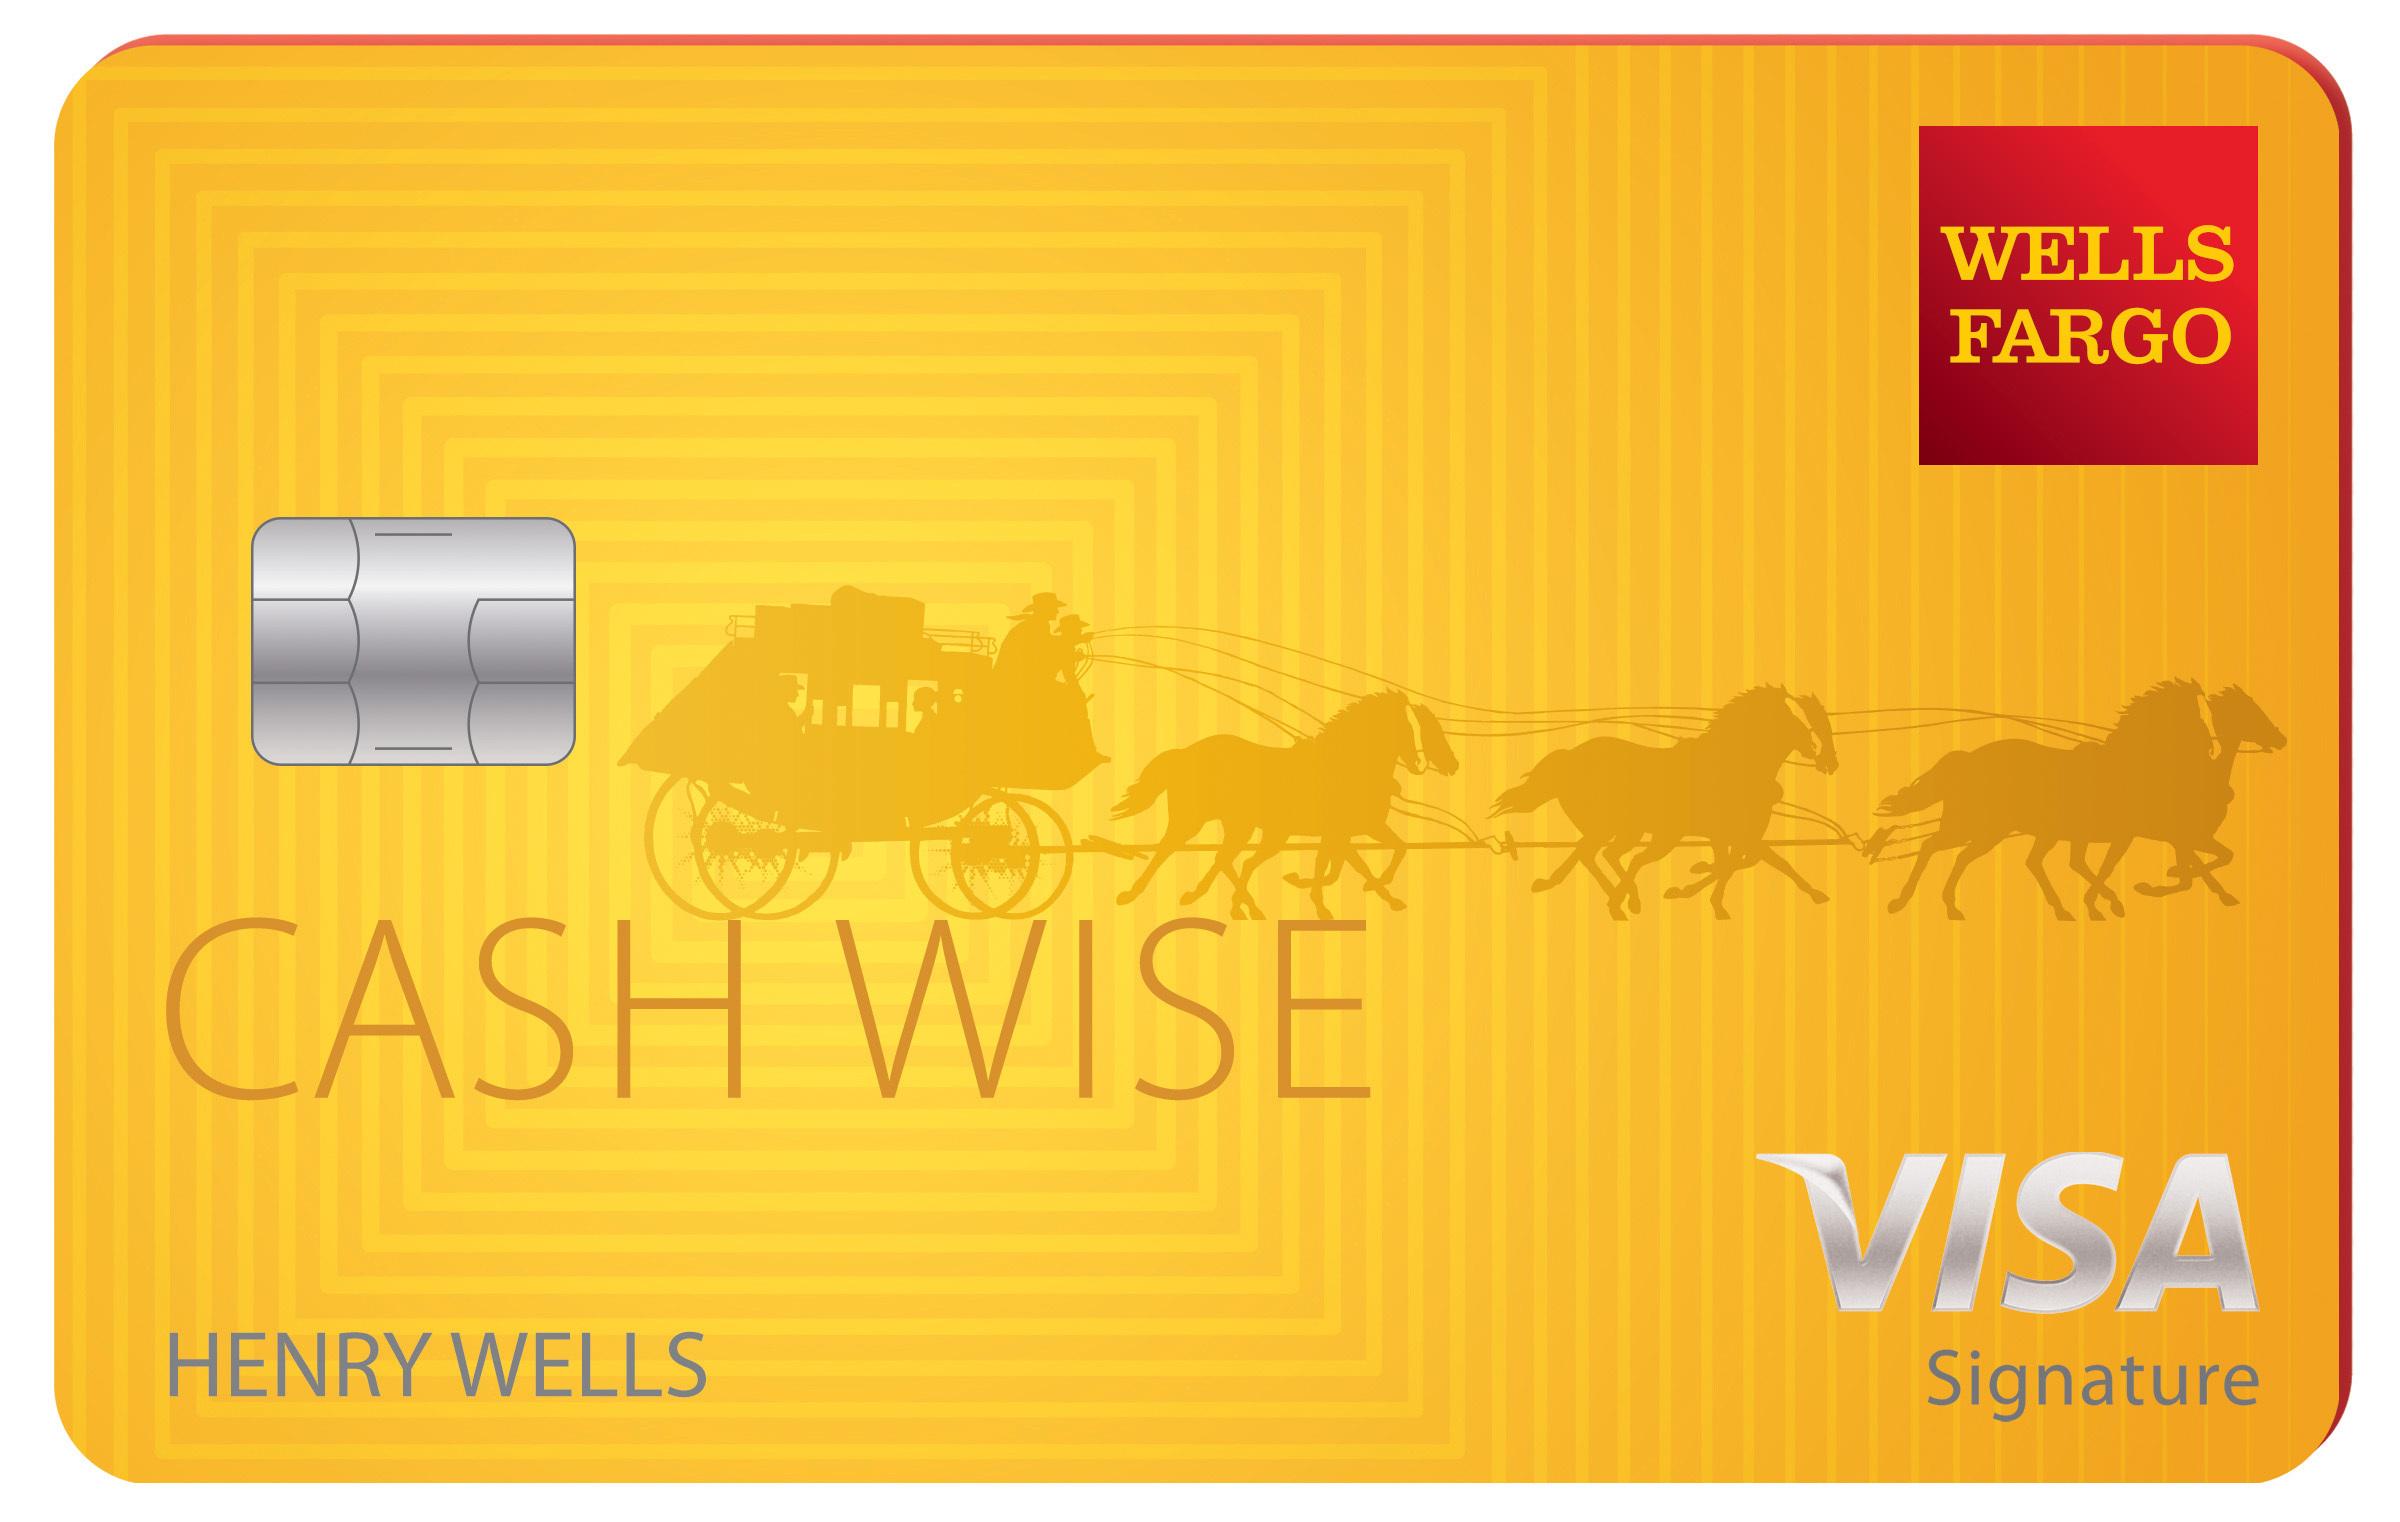 Wells Fargo Newsroom - Customers Earn More Cash Rewards With Wells